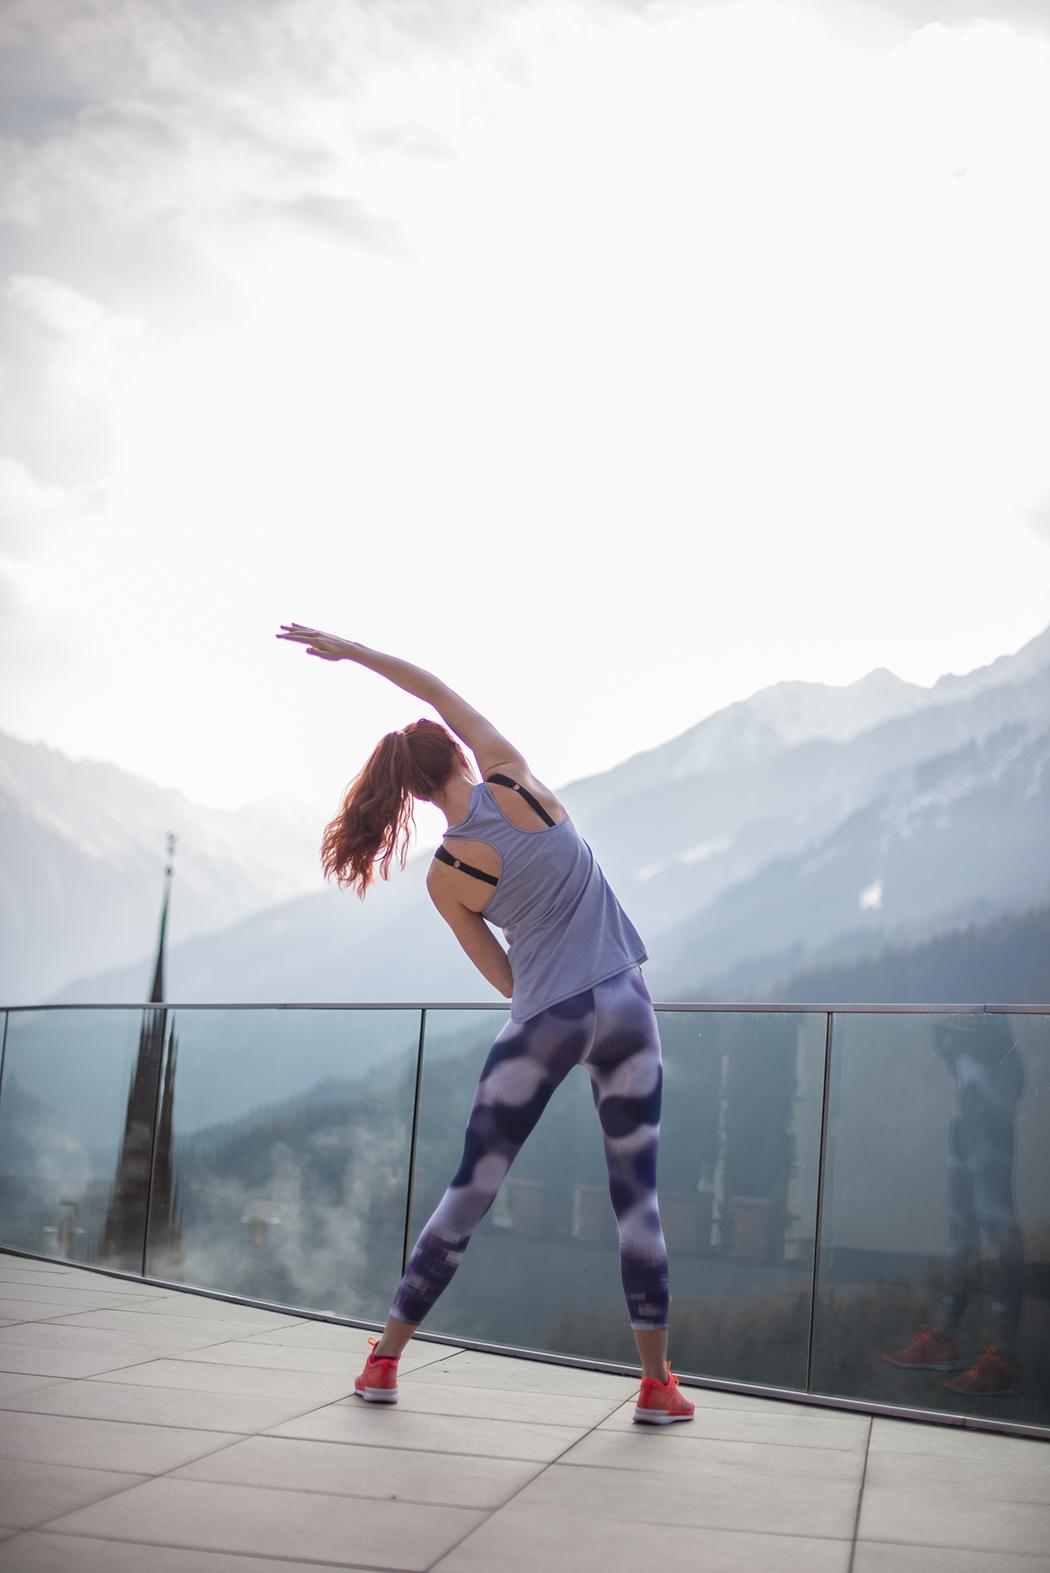 Fitnessblog-Deutschland-Fitnessblogger-München-Odlo-SS15-Stock-Resort-Mayrhofen-Zillertal-Österreich-Fitnessstudio-Travelblog-Travelblogger-Lindarella-1